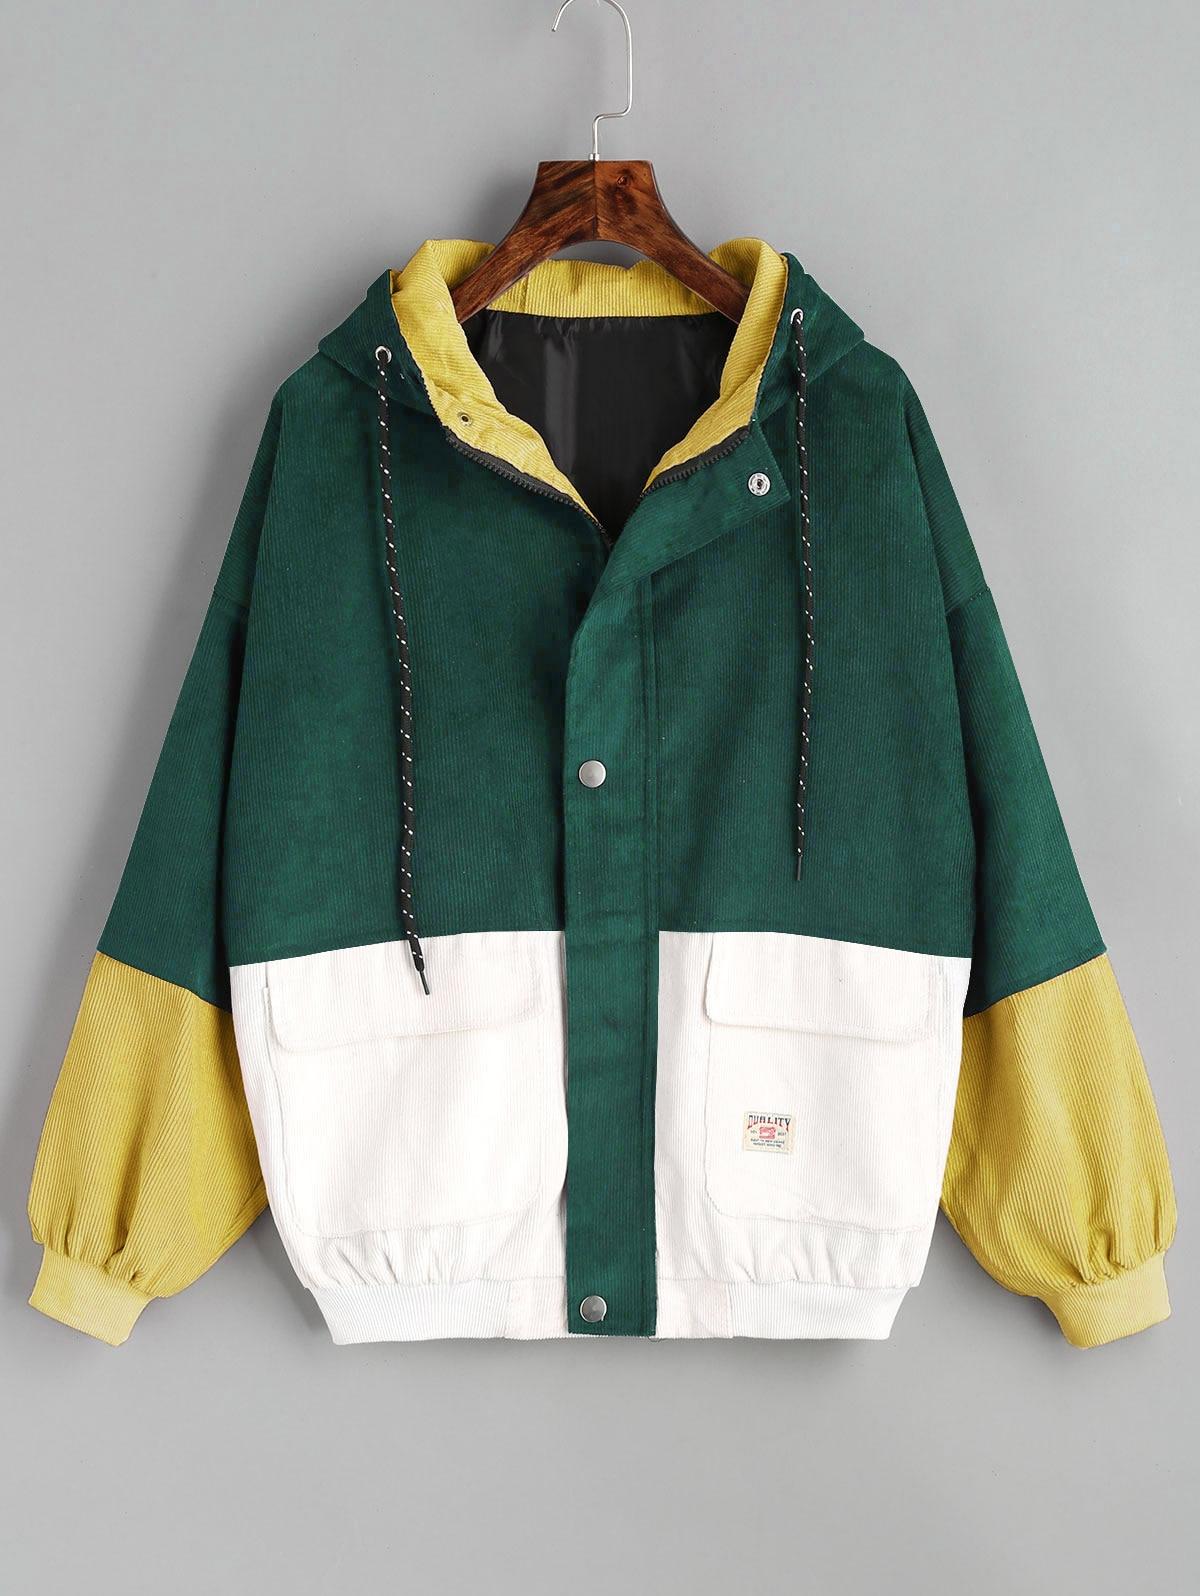 HTB1jluGhh6I8KJjy0Fgq6xXzVXa4 - Jackets Women Hip Hop Zipper Up Hoodies Coat female 2018 Casual Streetwear Outerwear PTC 302